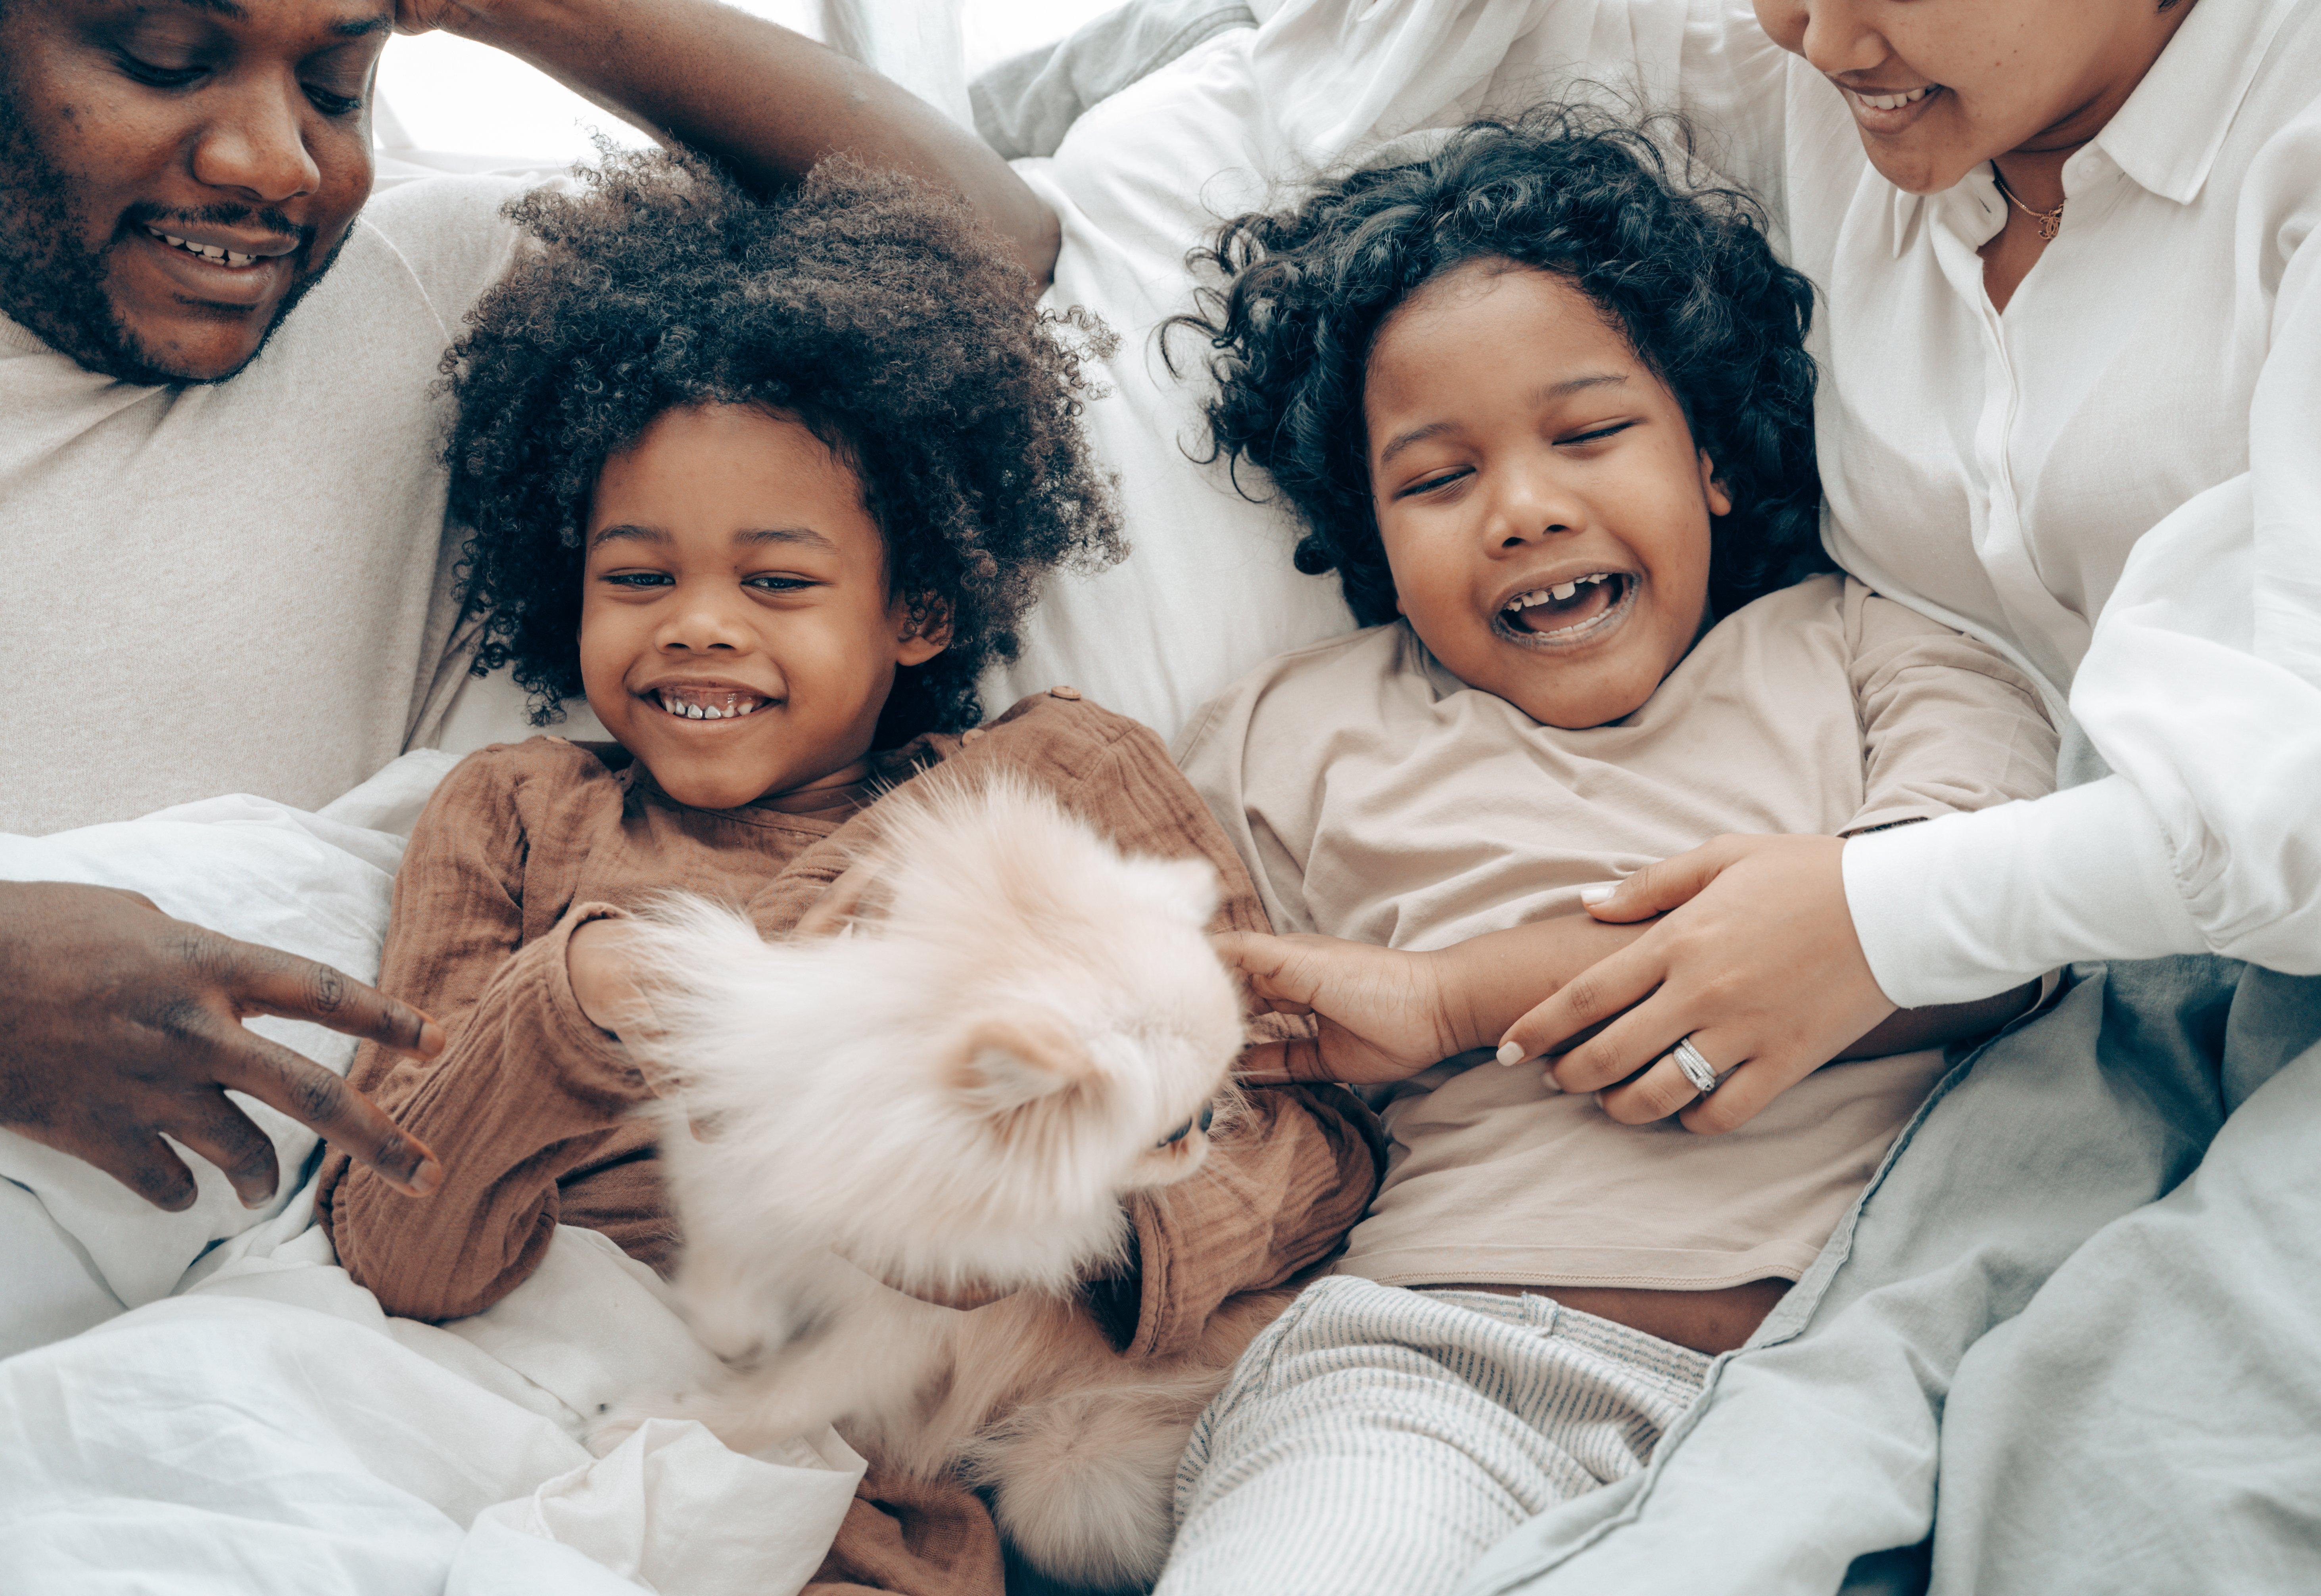 happy-family-smiling-4545205